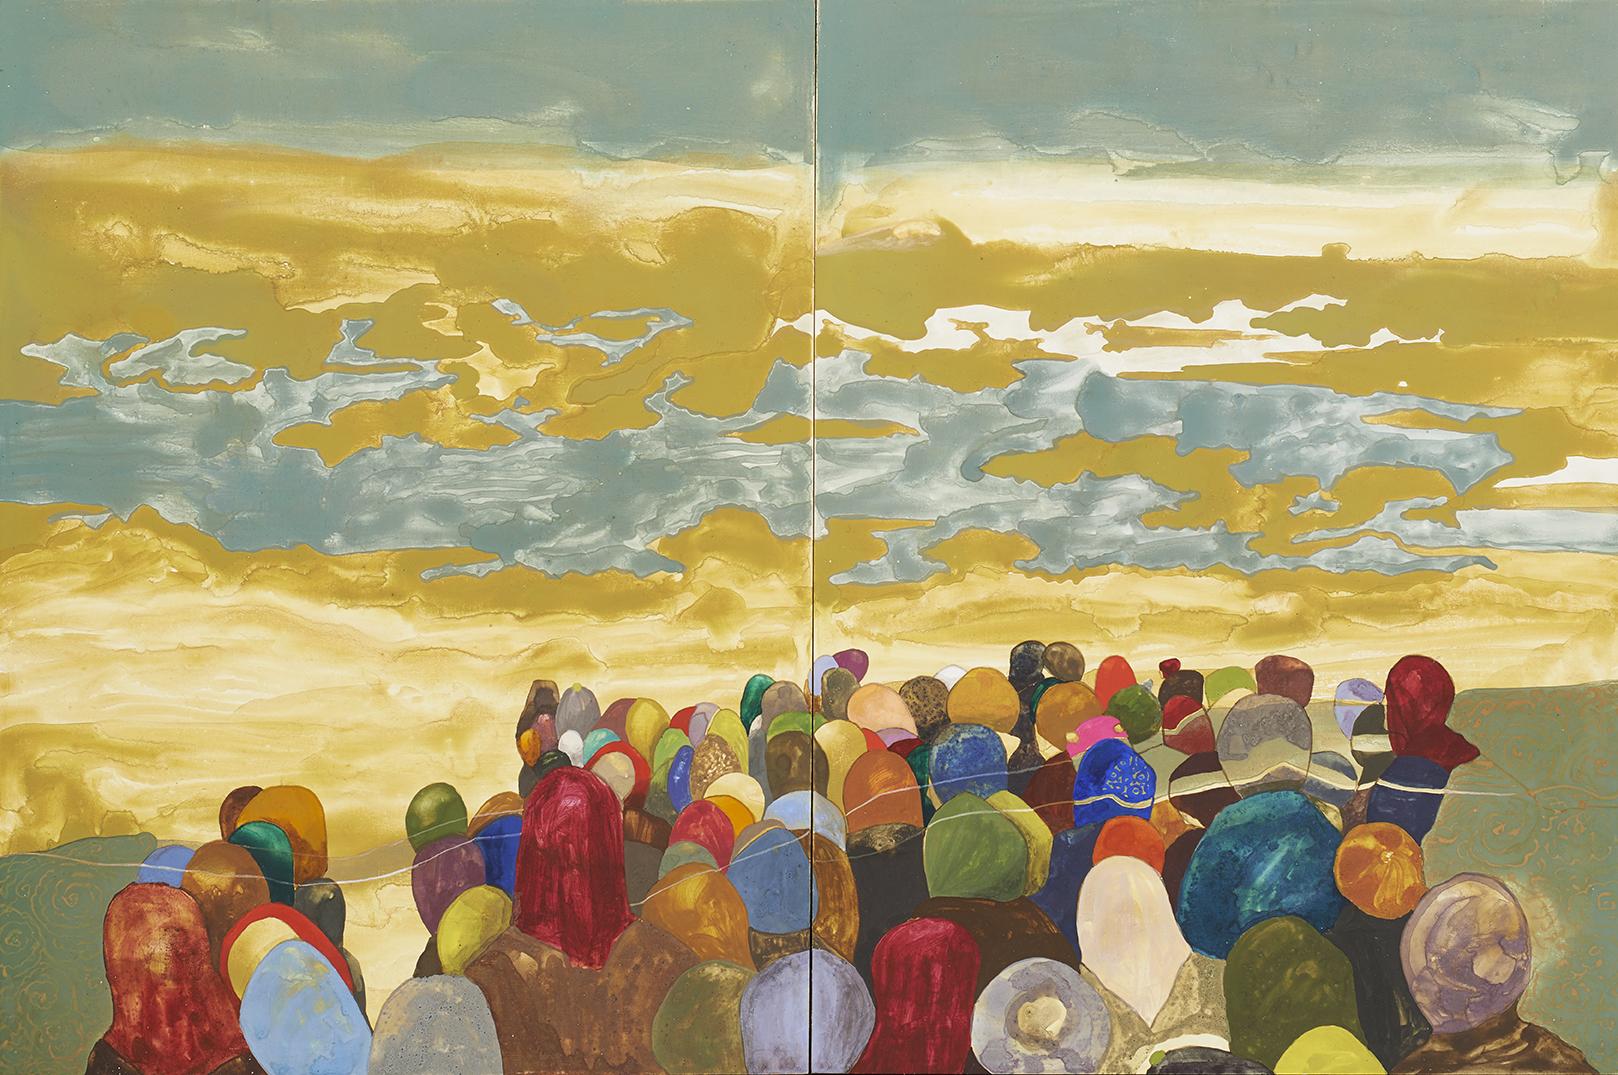 Crossing (Diptych), 2013, Egg Tempera on Wood,30 x 40 cm x 2